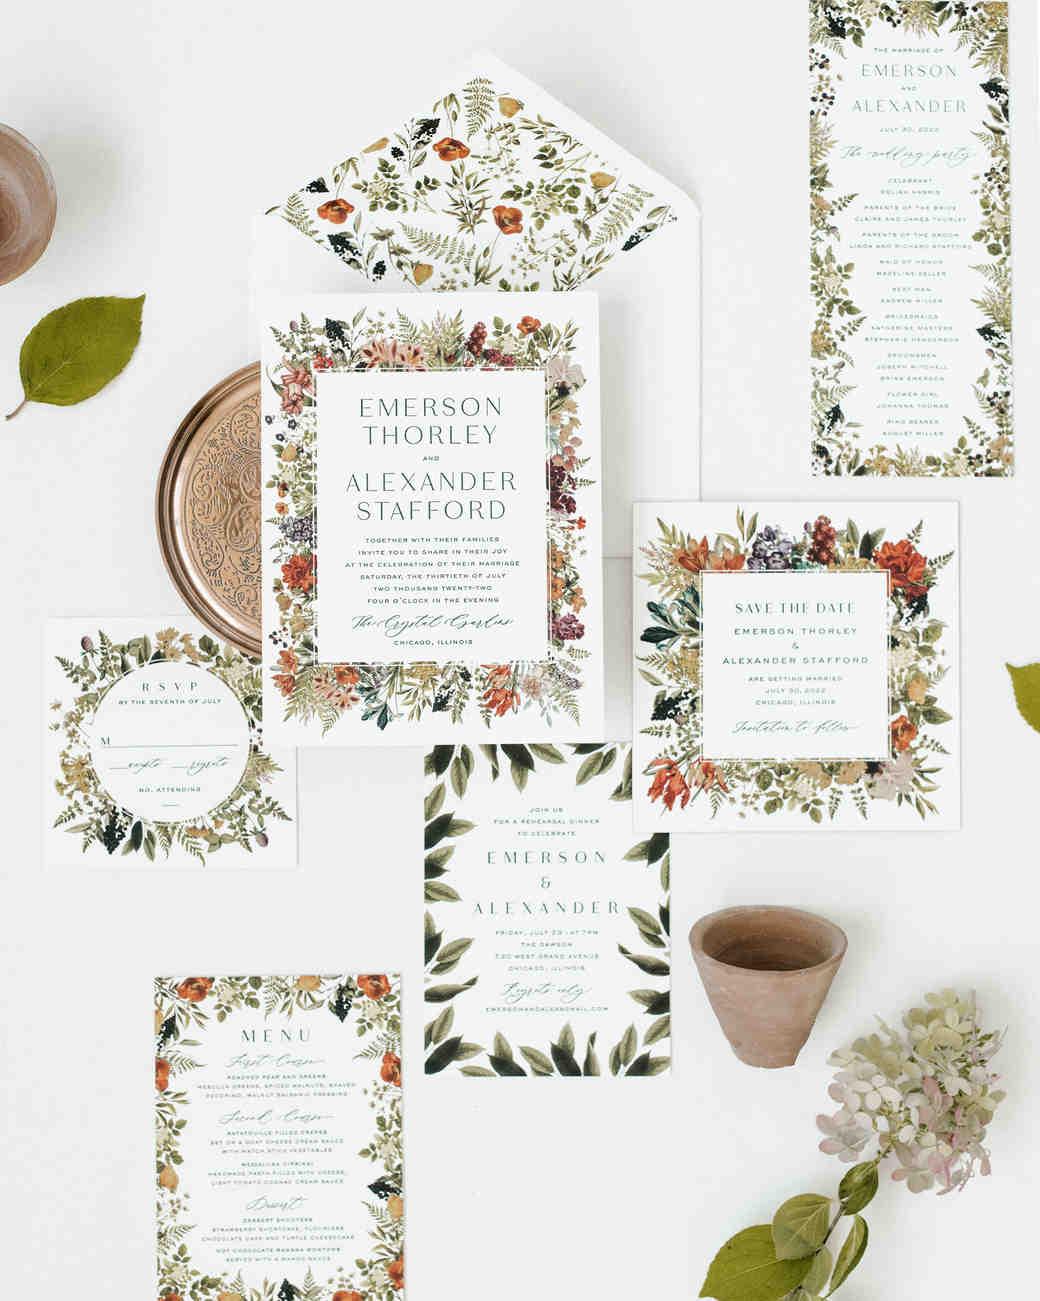 invitation suite with floral motif